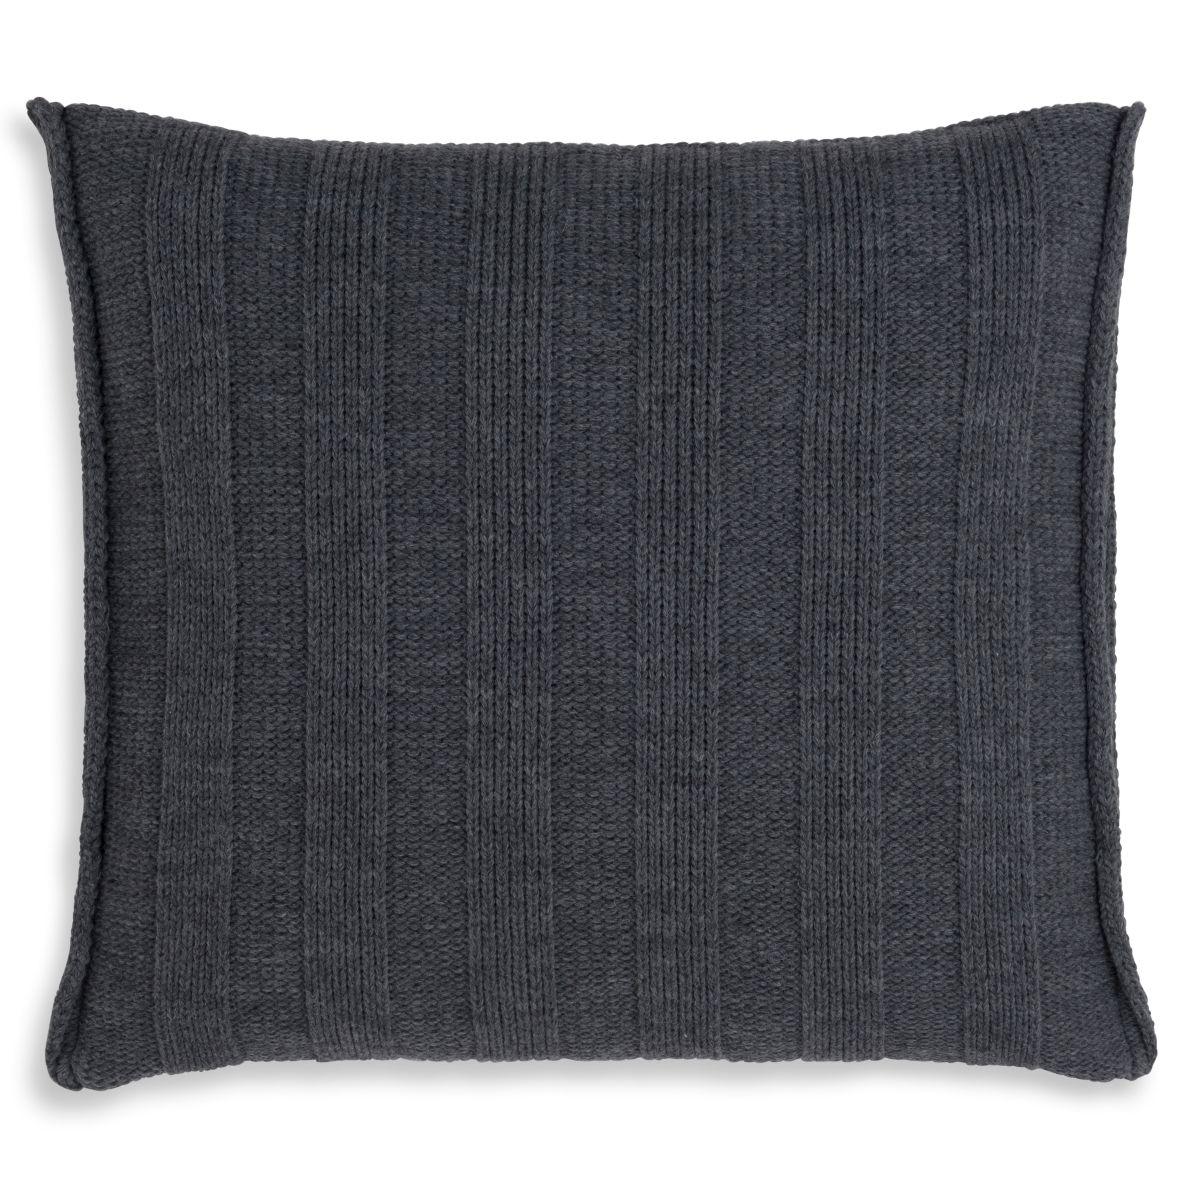 knit factory 1091210 kussen 50x50 jesse antraciet 2